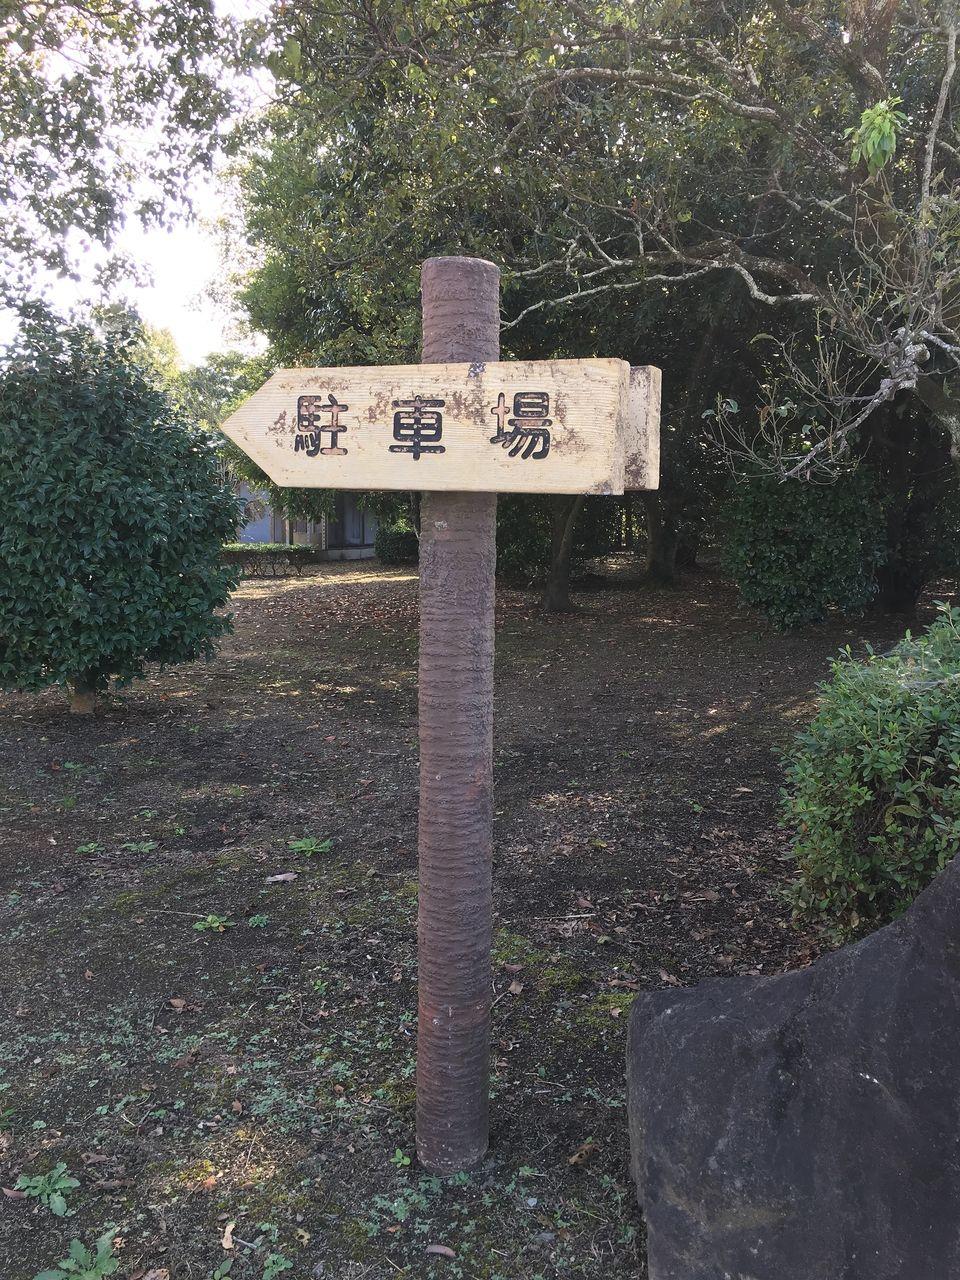 浮島周辺水辺公園 駐車場の看板